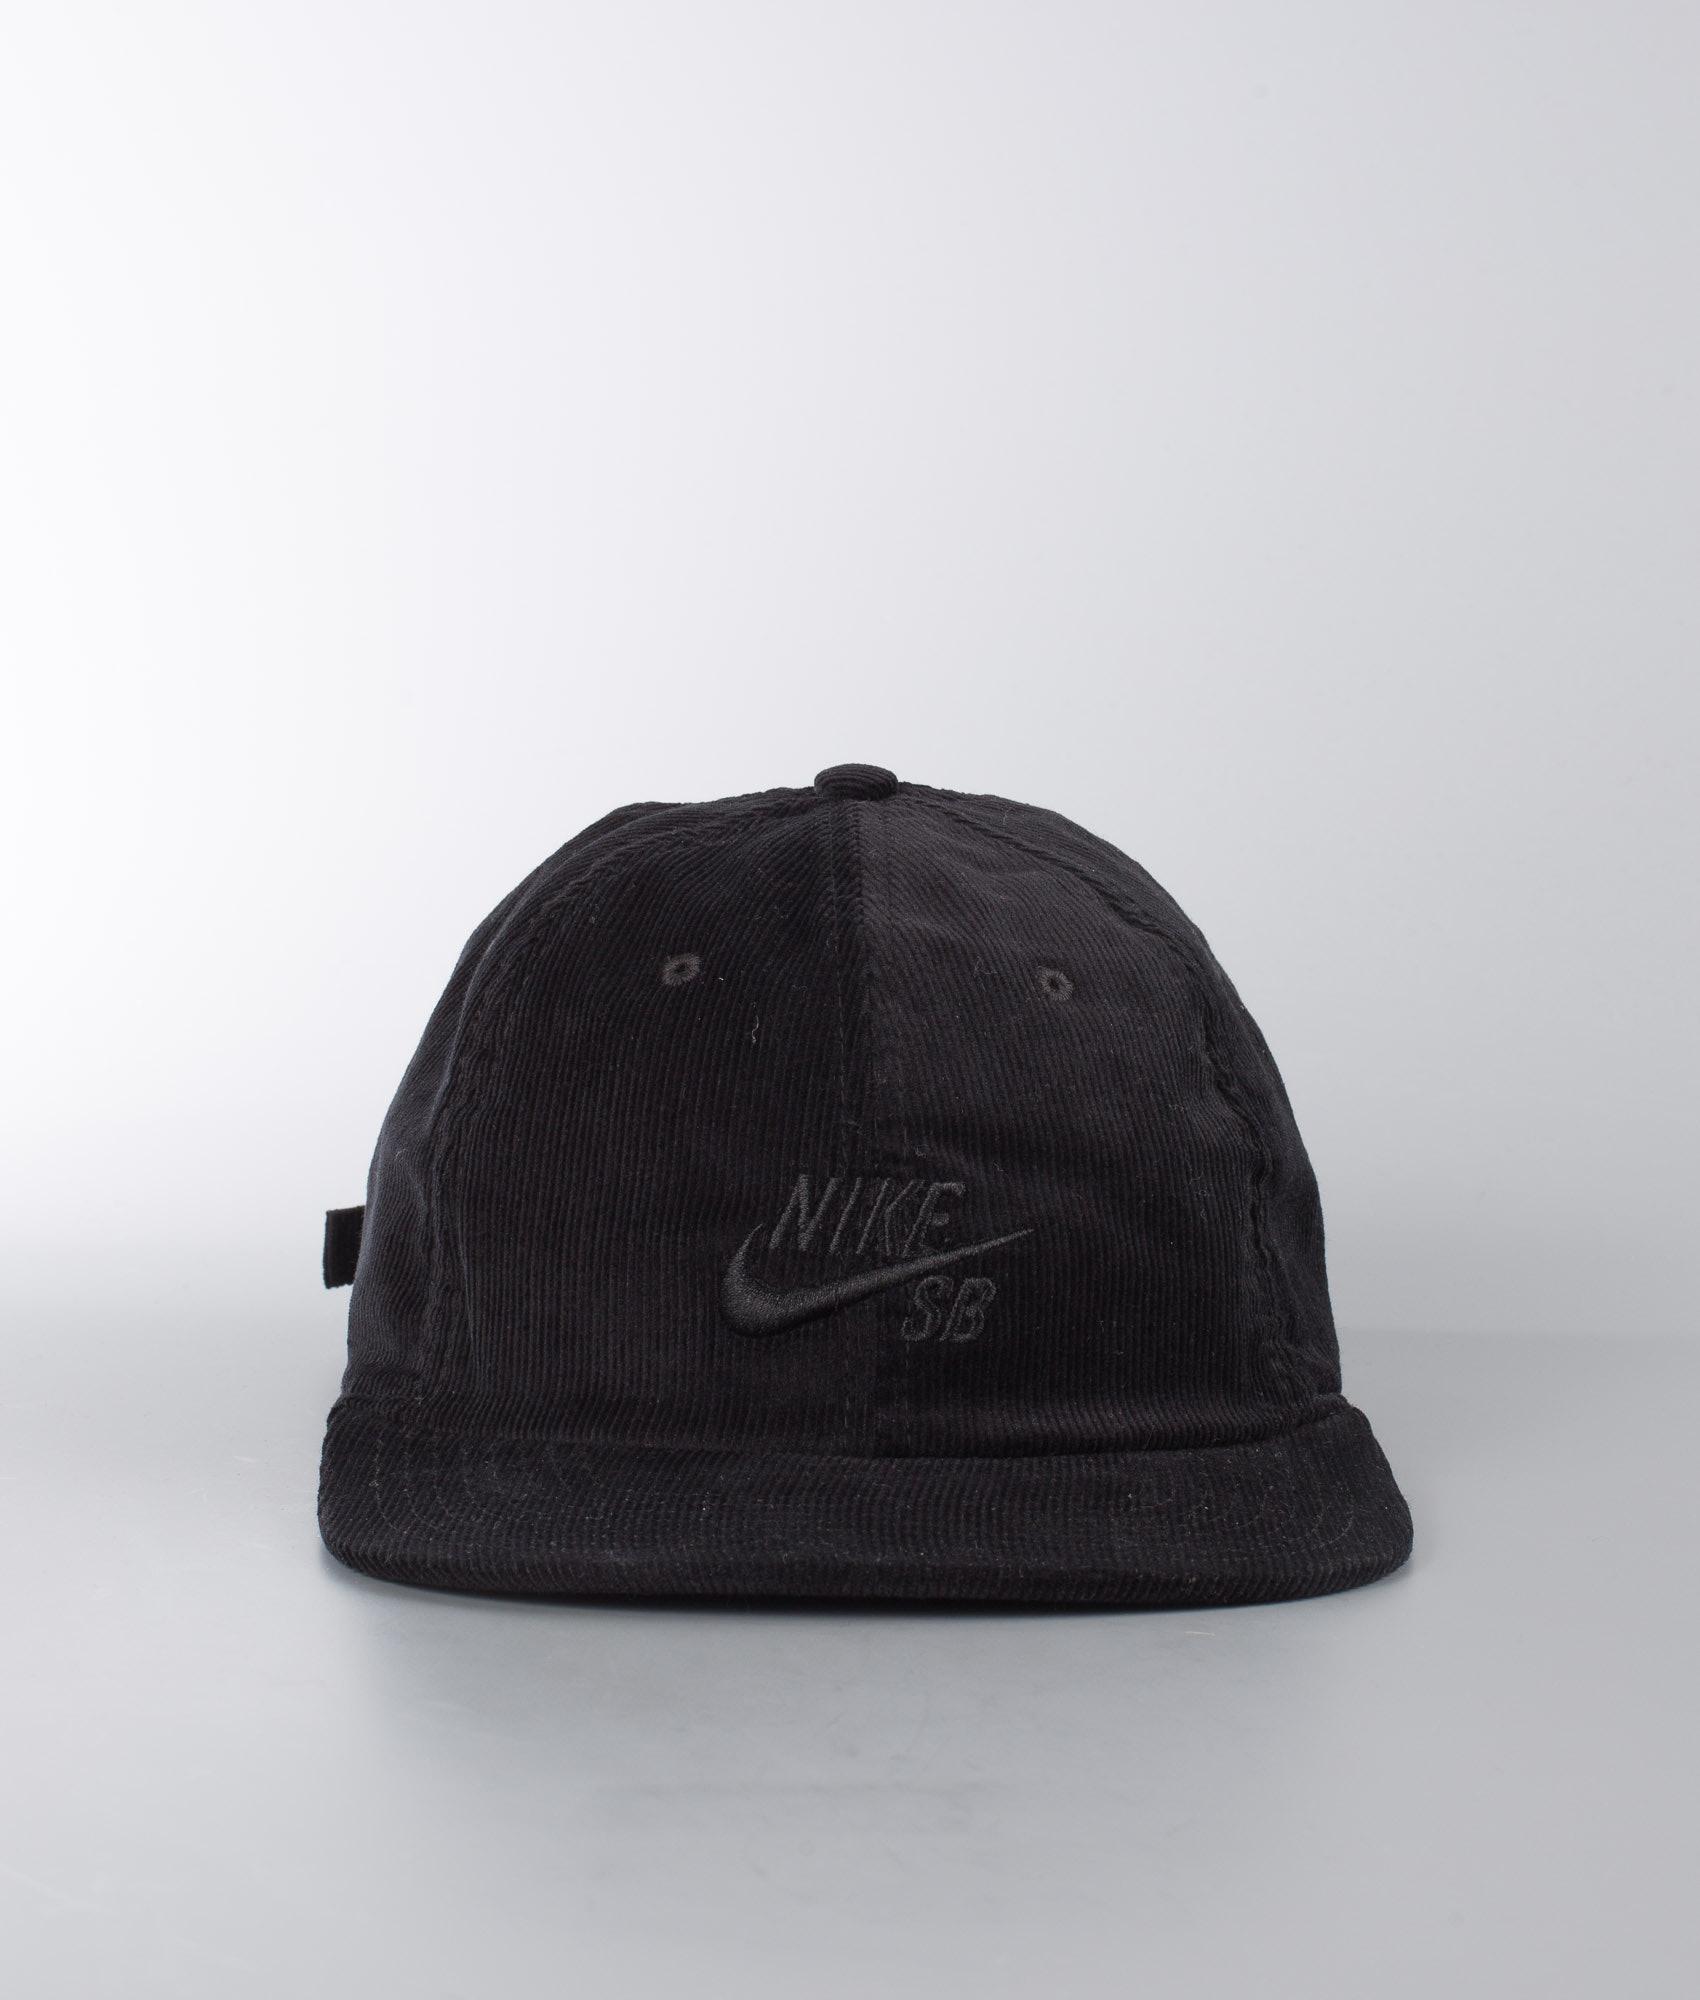 a932f89a Nike Heritage 86 Flatbill Cap Black/Black - Ridestore.com